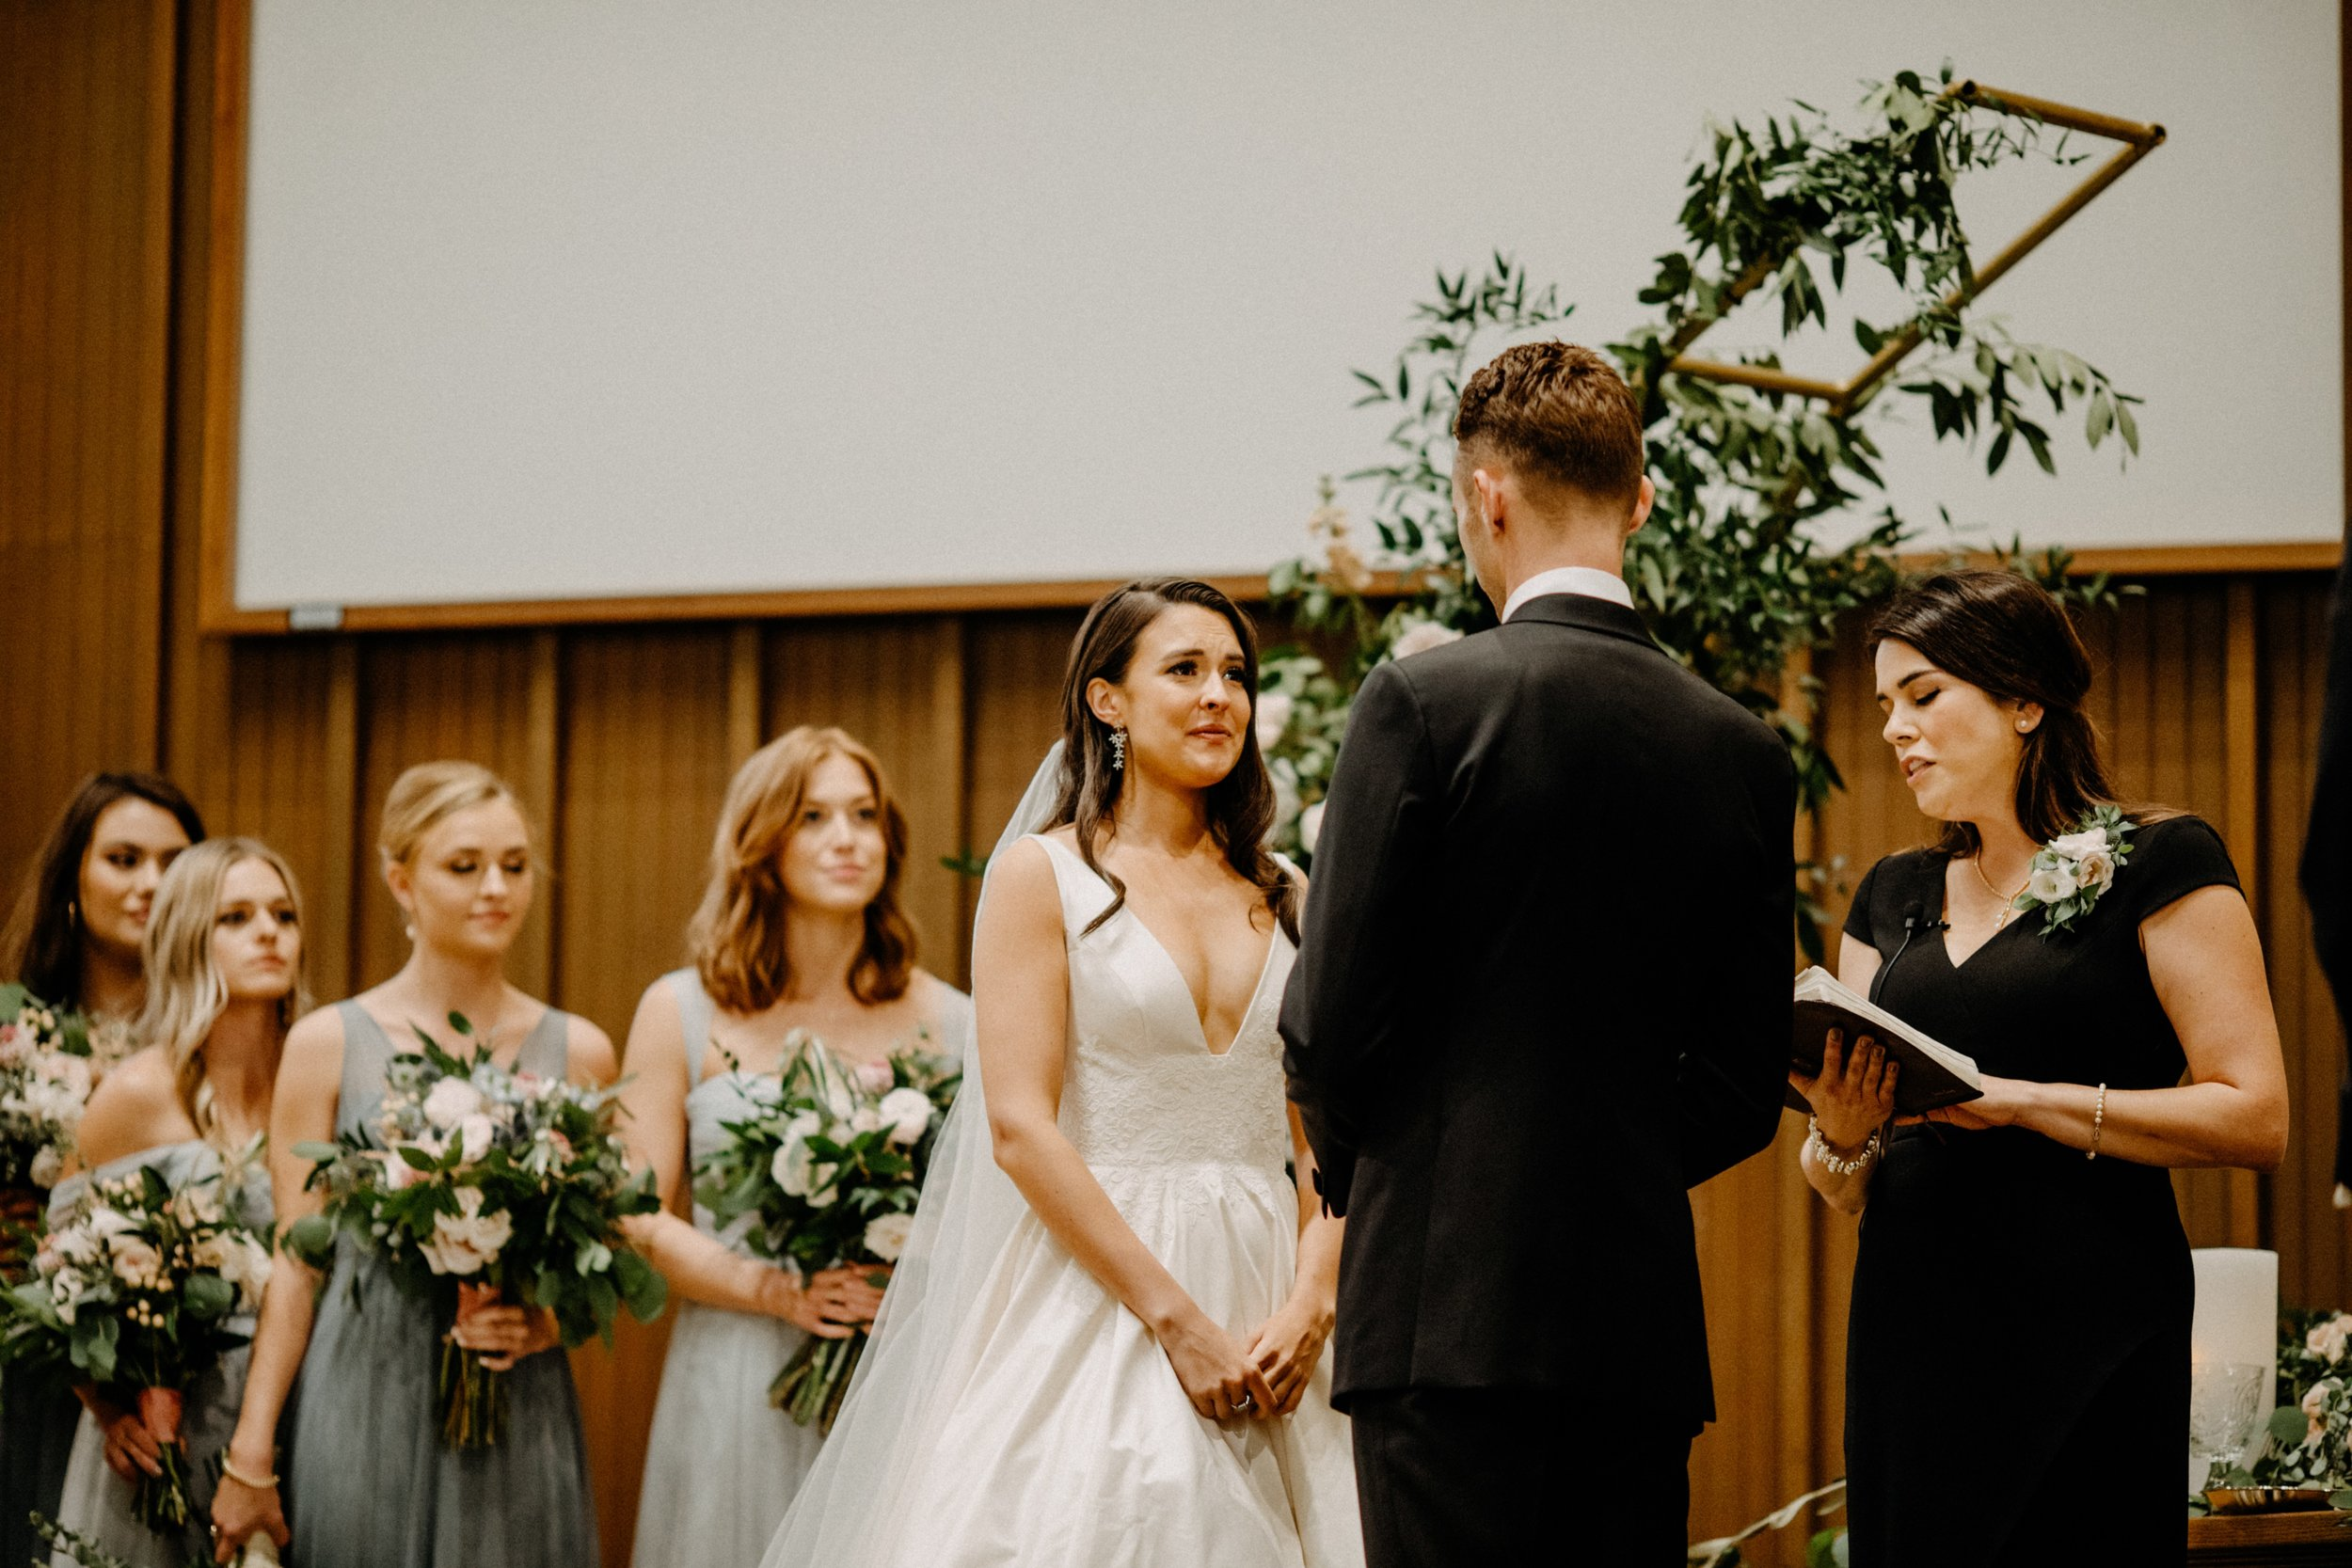 st-anthony-hotel-wedding-photography-10074san-antonio.JPG